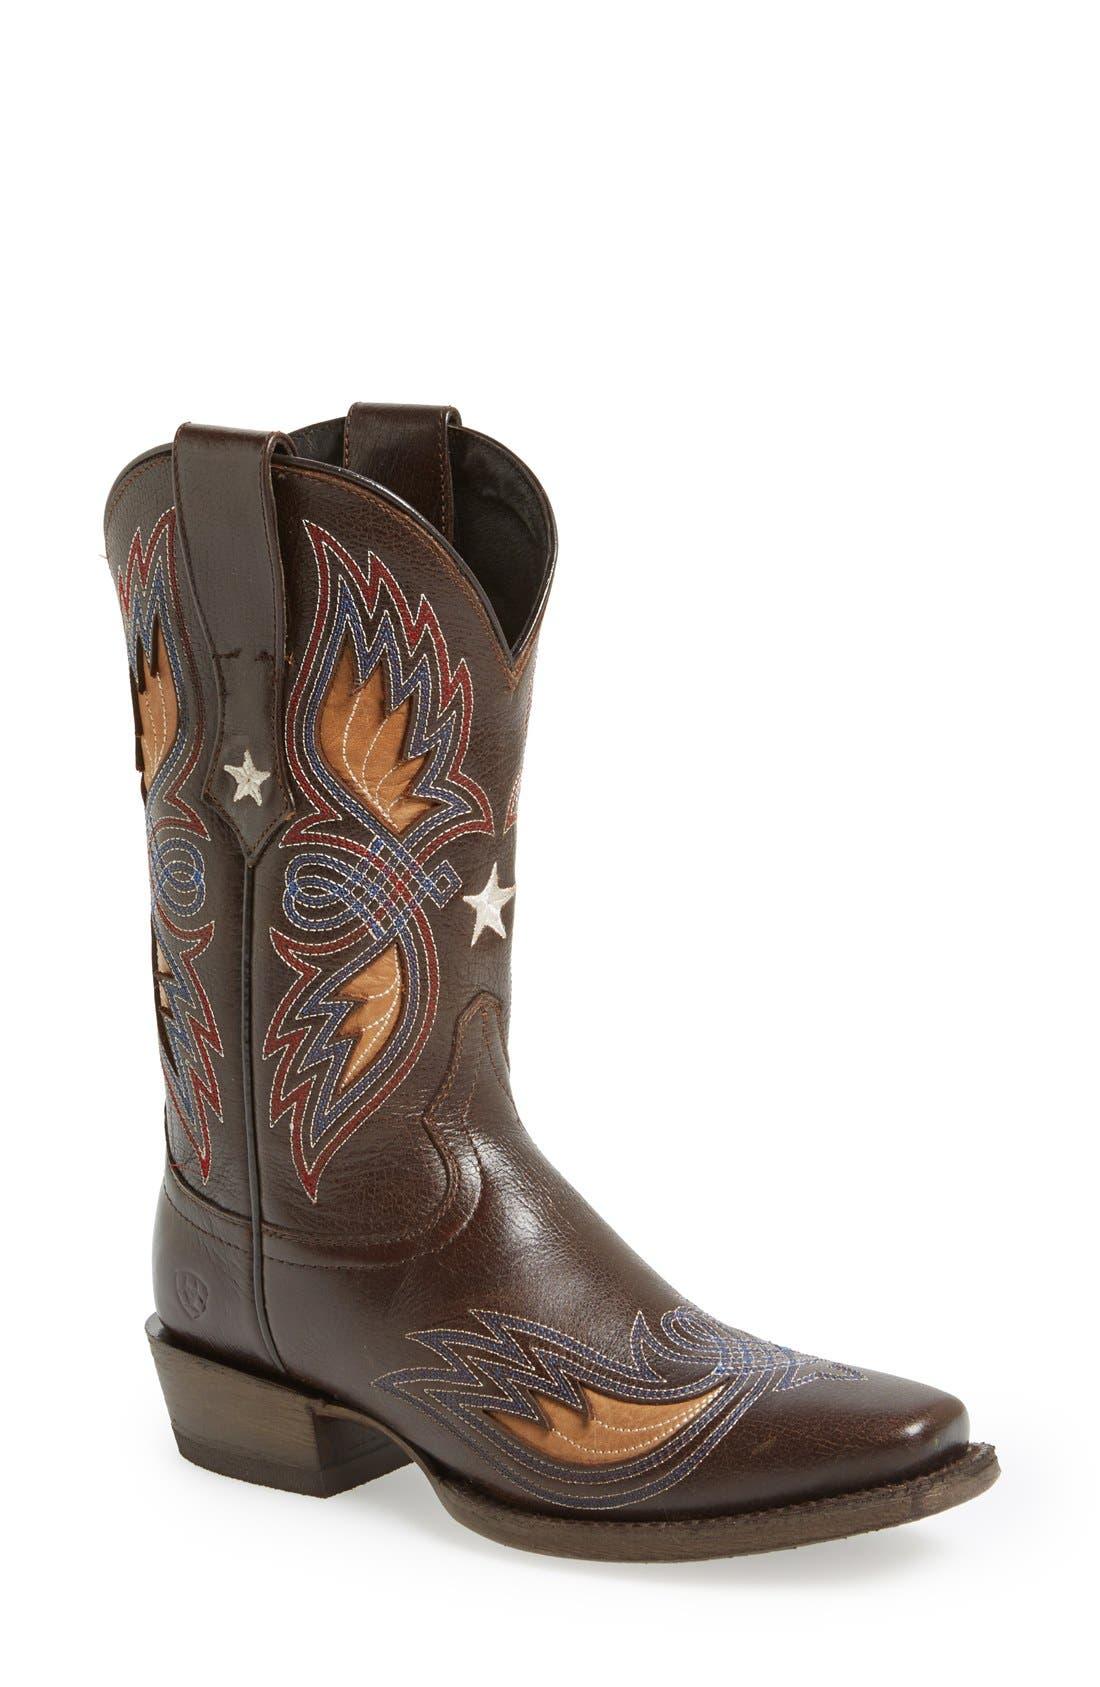 Main Image - Ariat 'Valencia' Western Boot (Women)